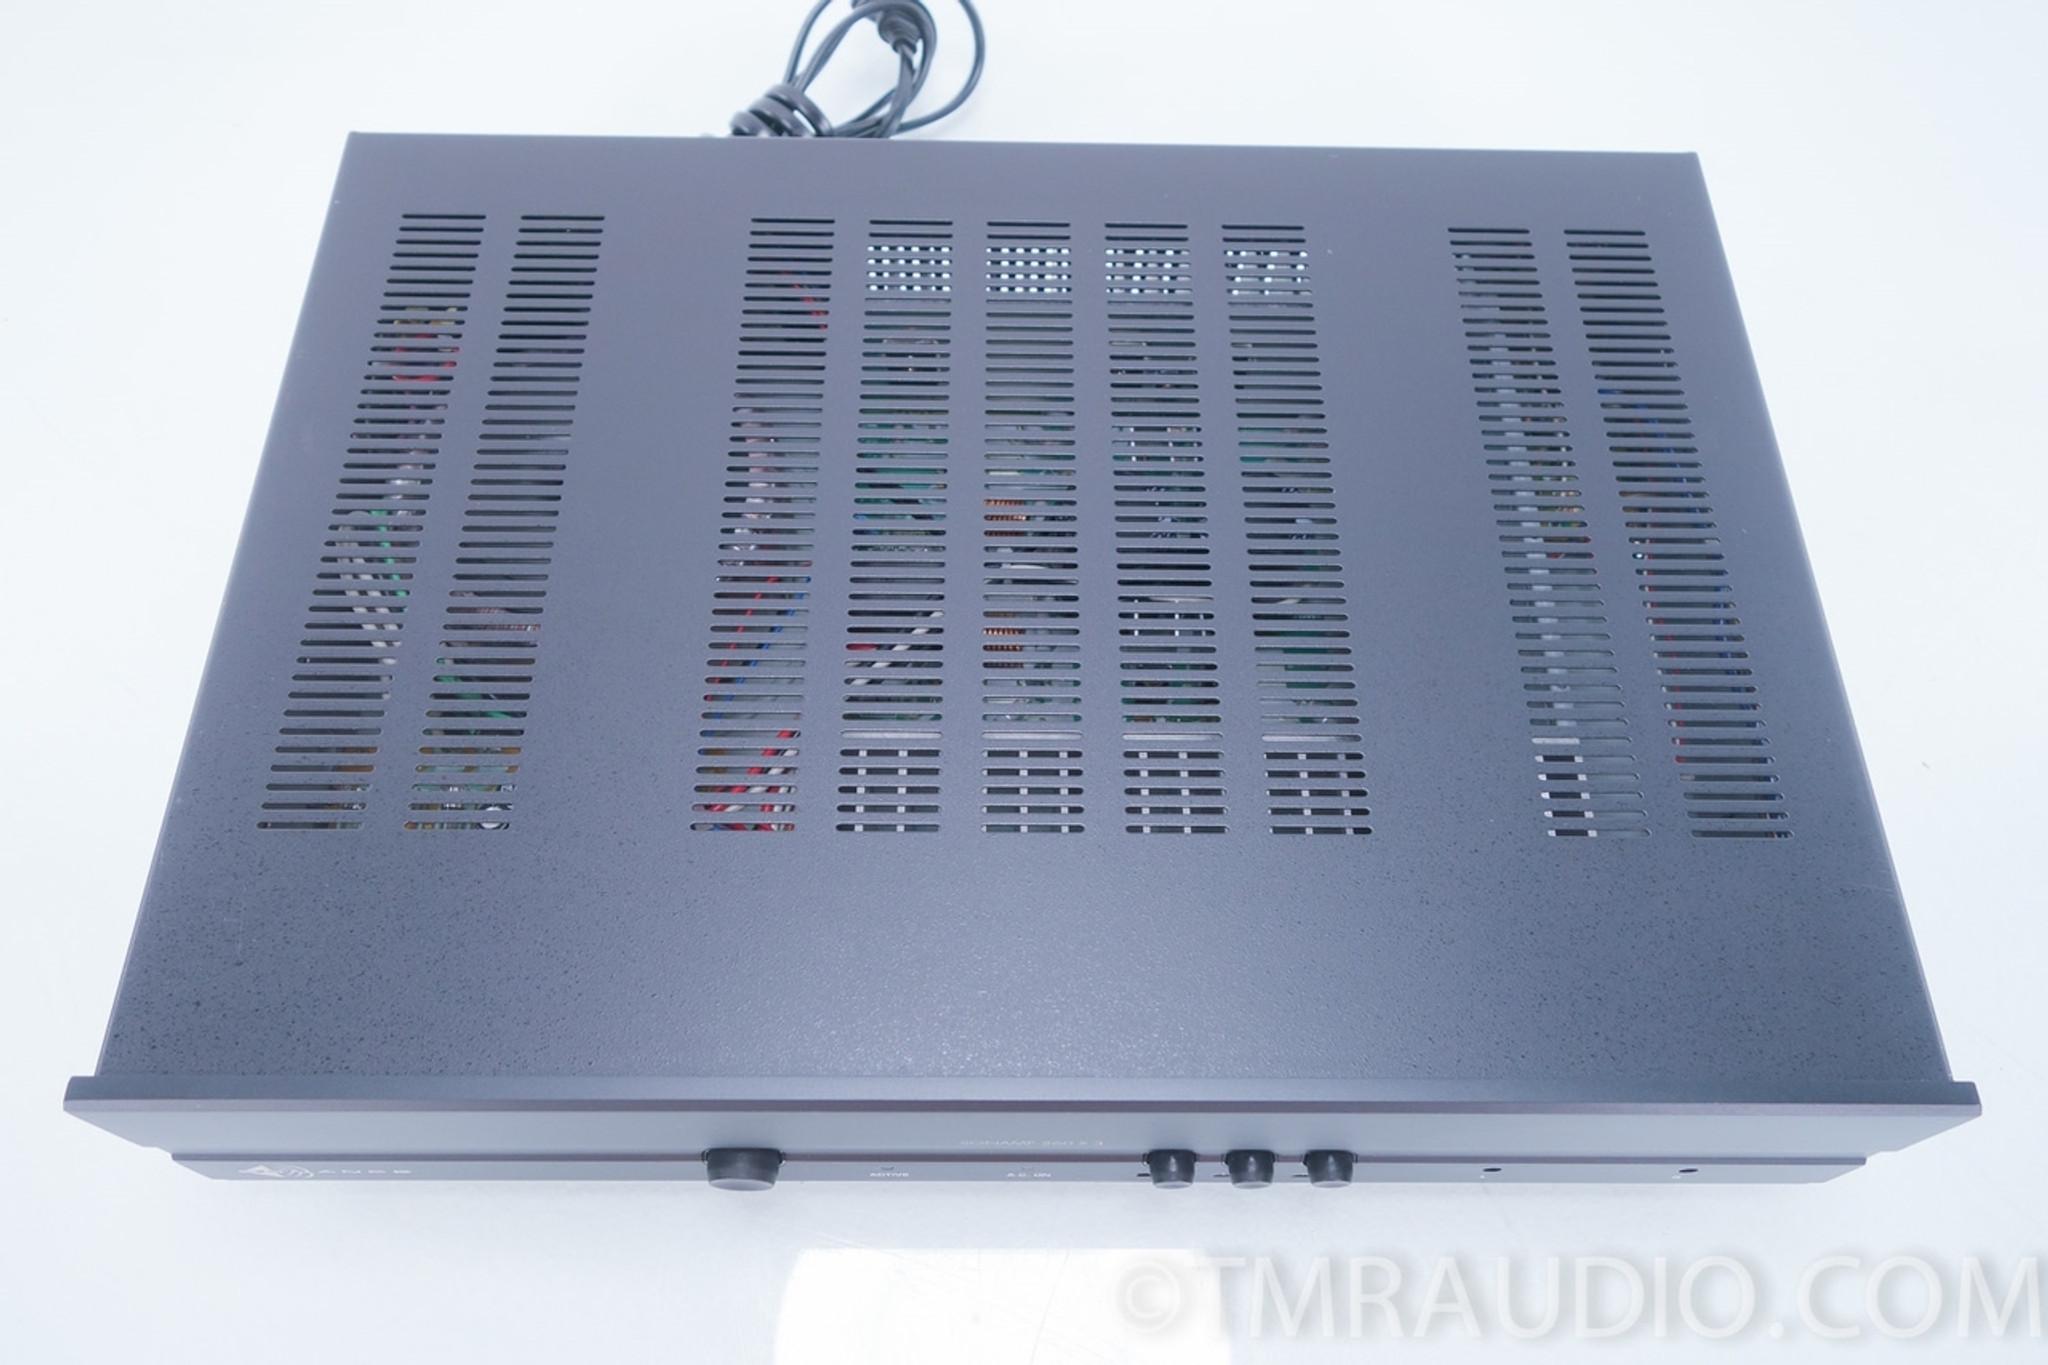 Sonance Sonamp 260 x 3 Stereo Multi-zone Power Amplifier - The Music